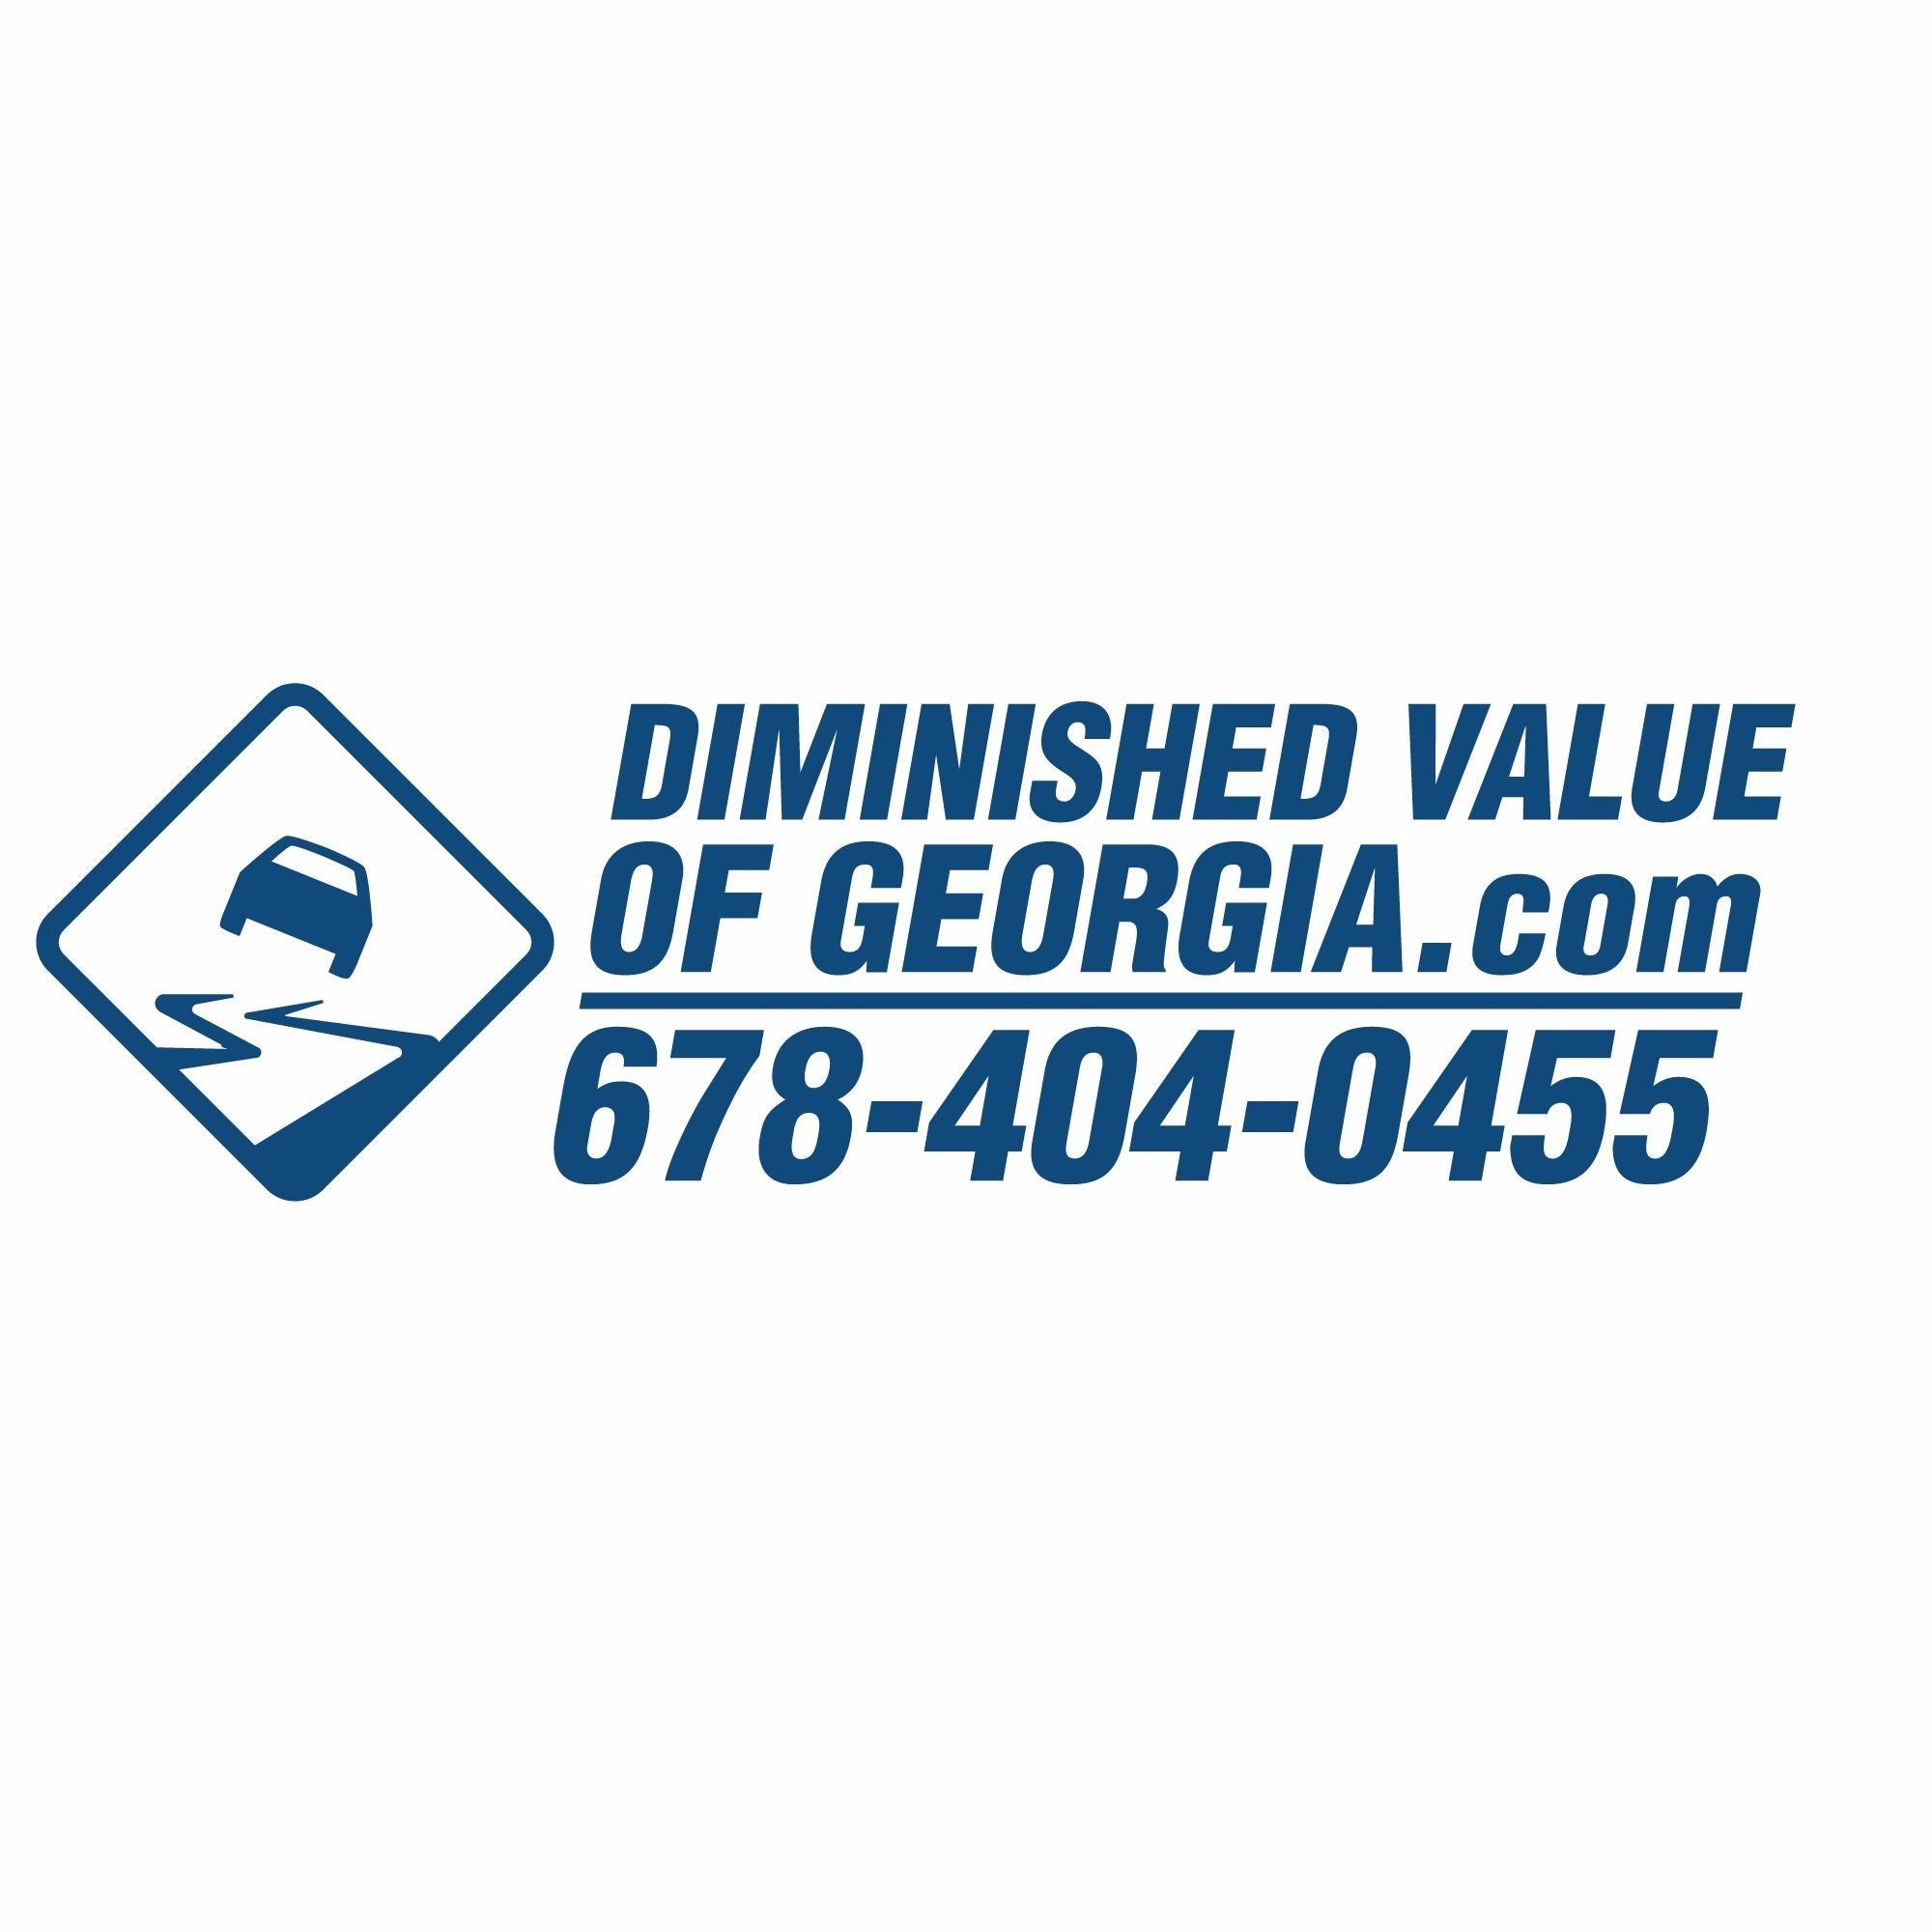 Diminished Value of Georgia